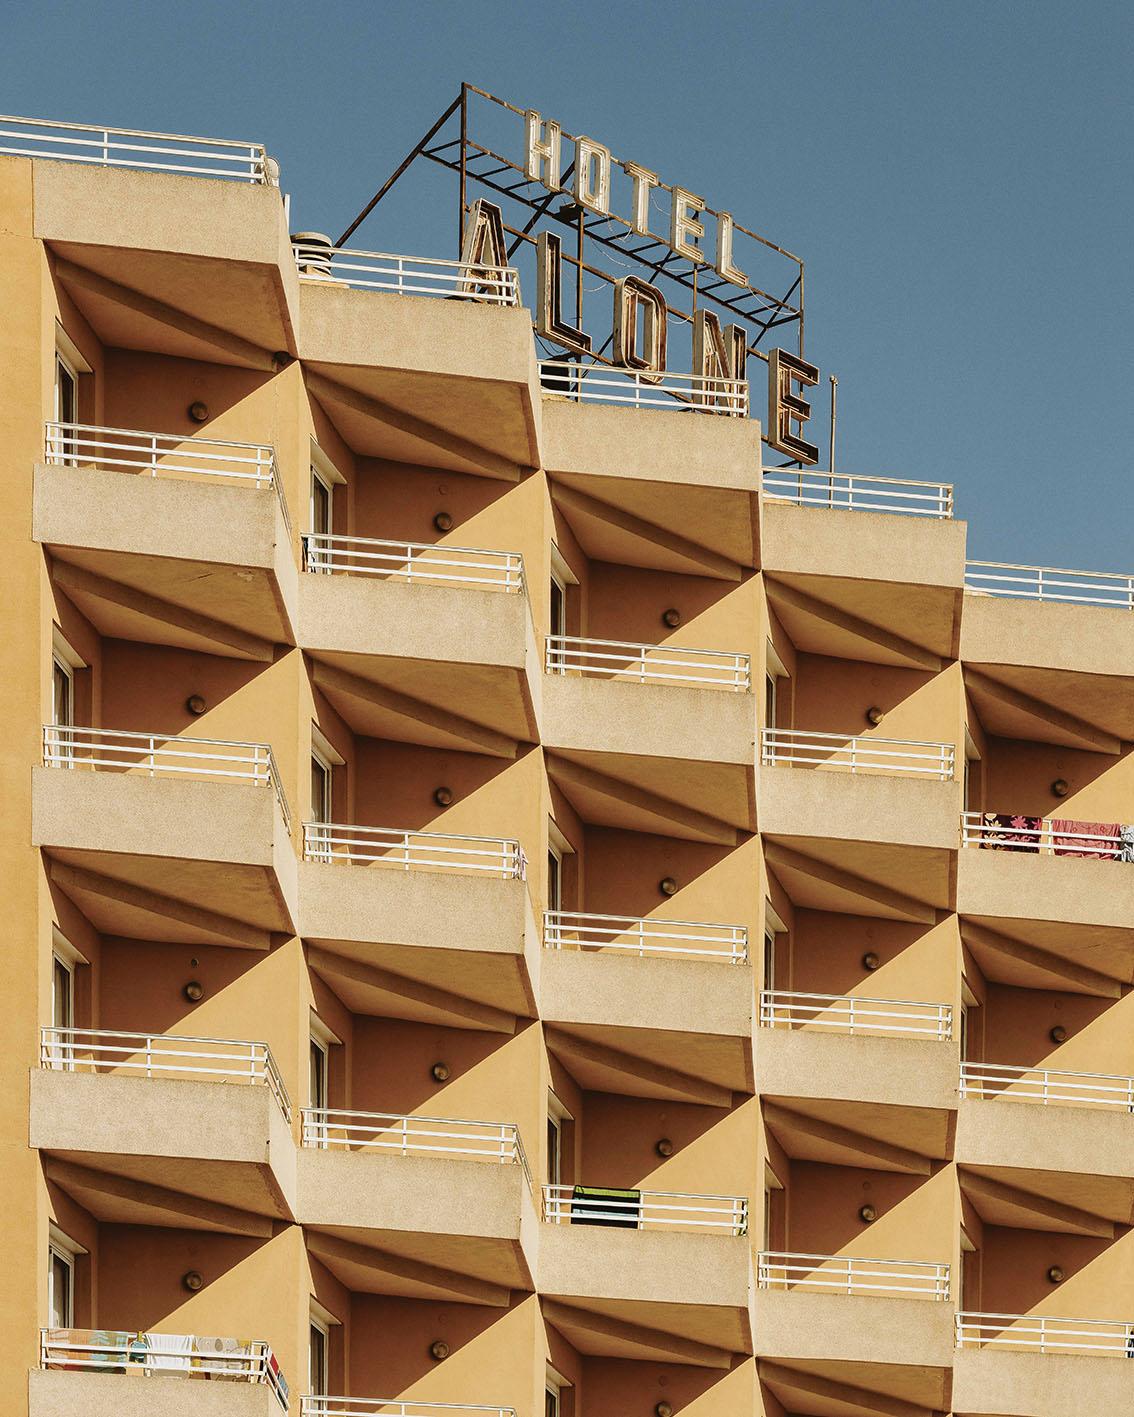 yosigo_arquitectura0.jpg